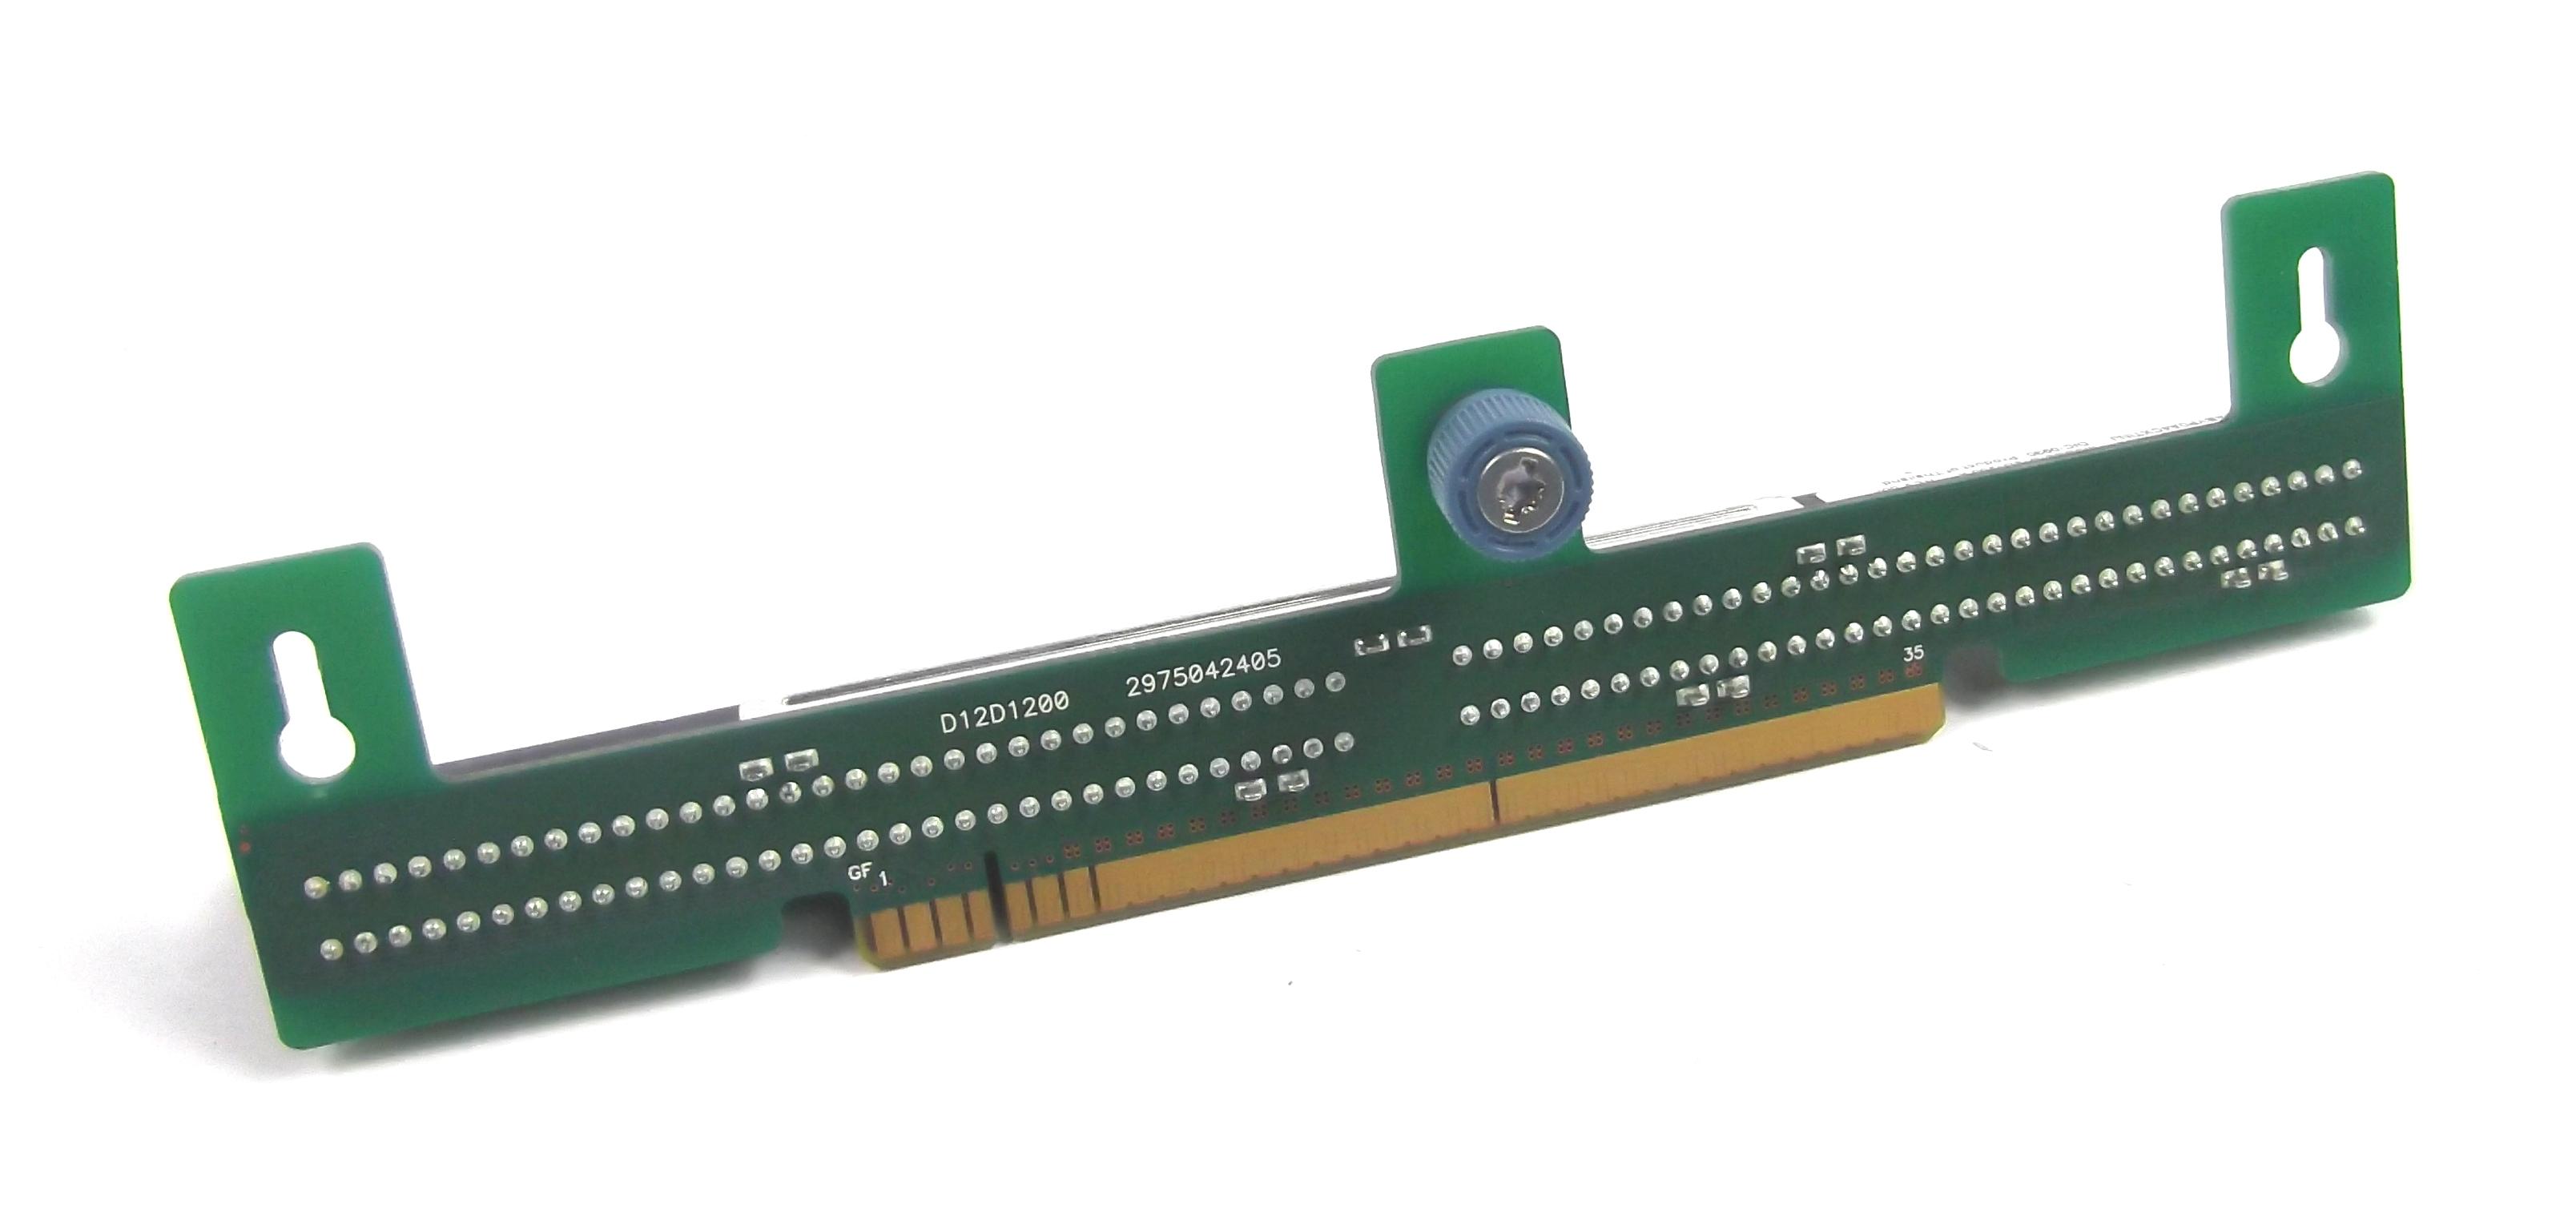 HP 496062-001 Proliant DL380 G6 G7 DL385 G7 Server Power Supply Backplane